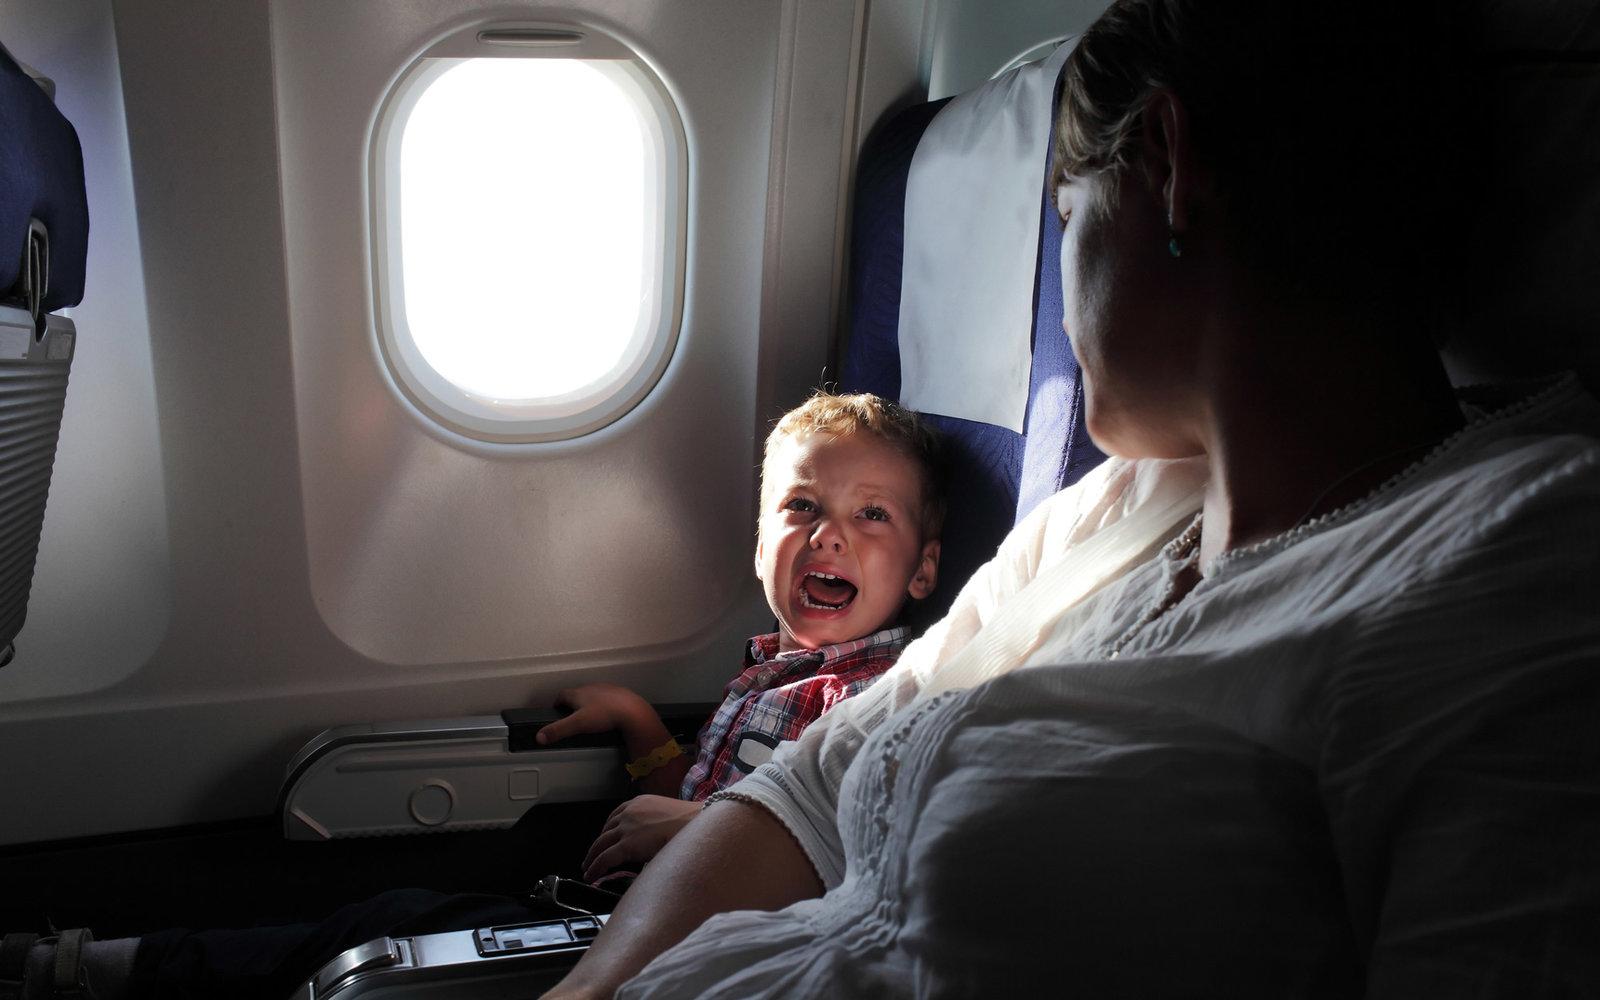 compagnia aerea per adulti